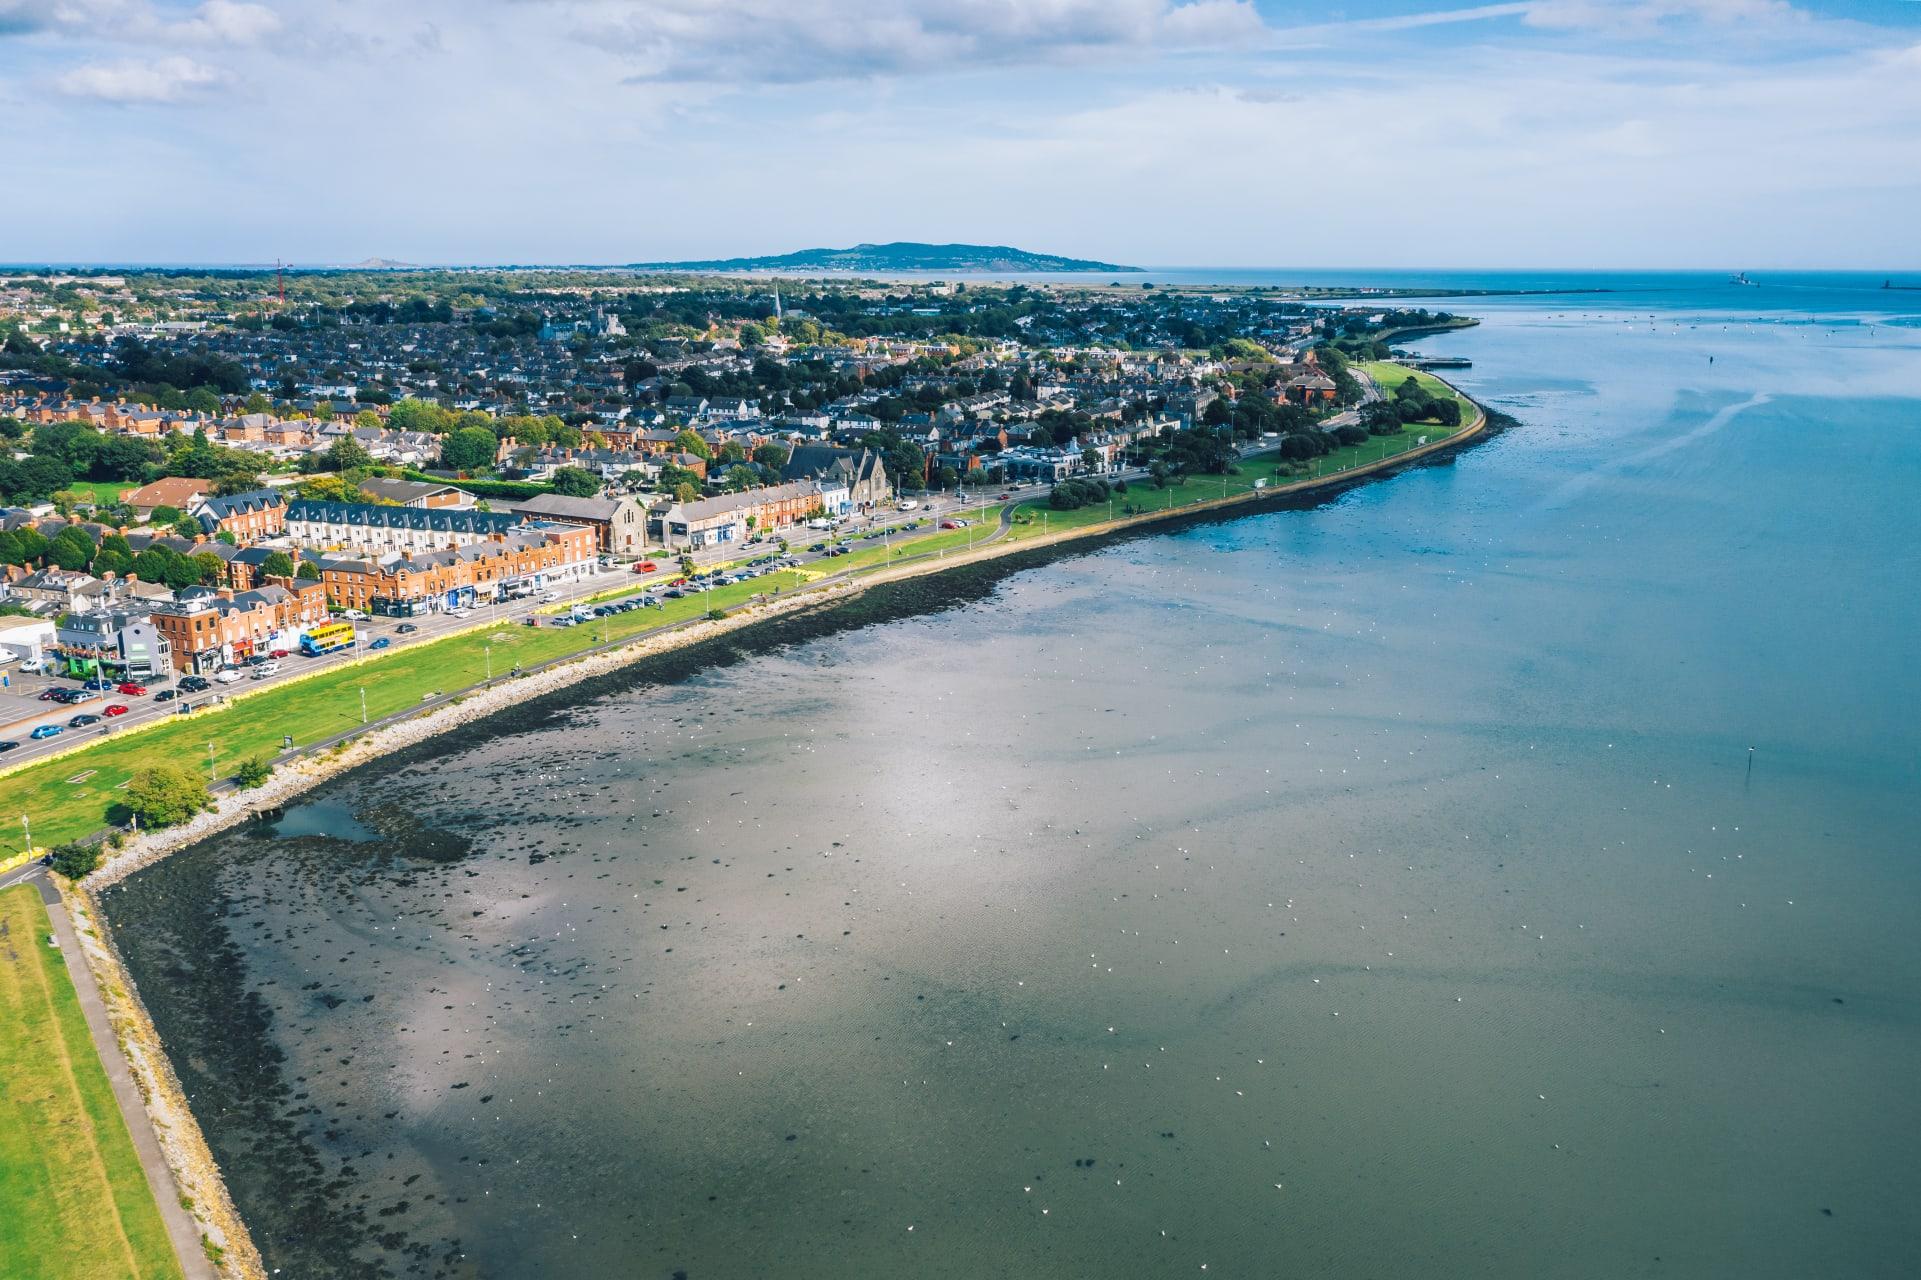 Dublin - Clontarf - A Quaint Neighbourhood Situated Along Dublin Bay